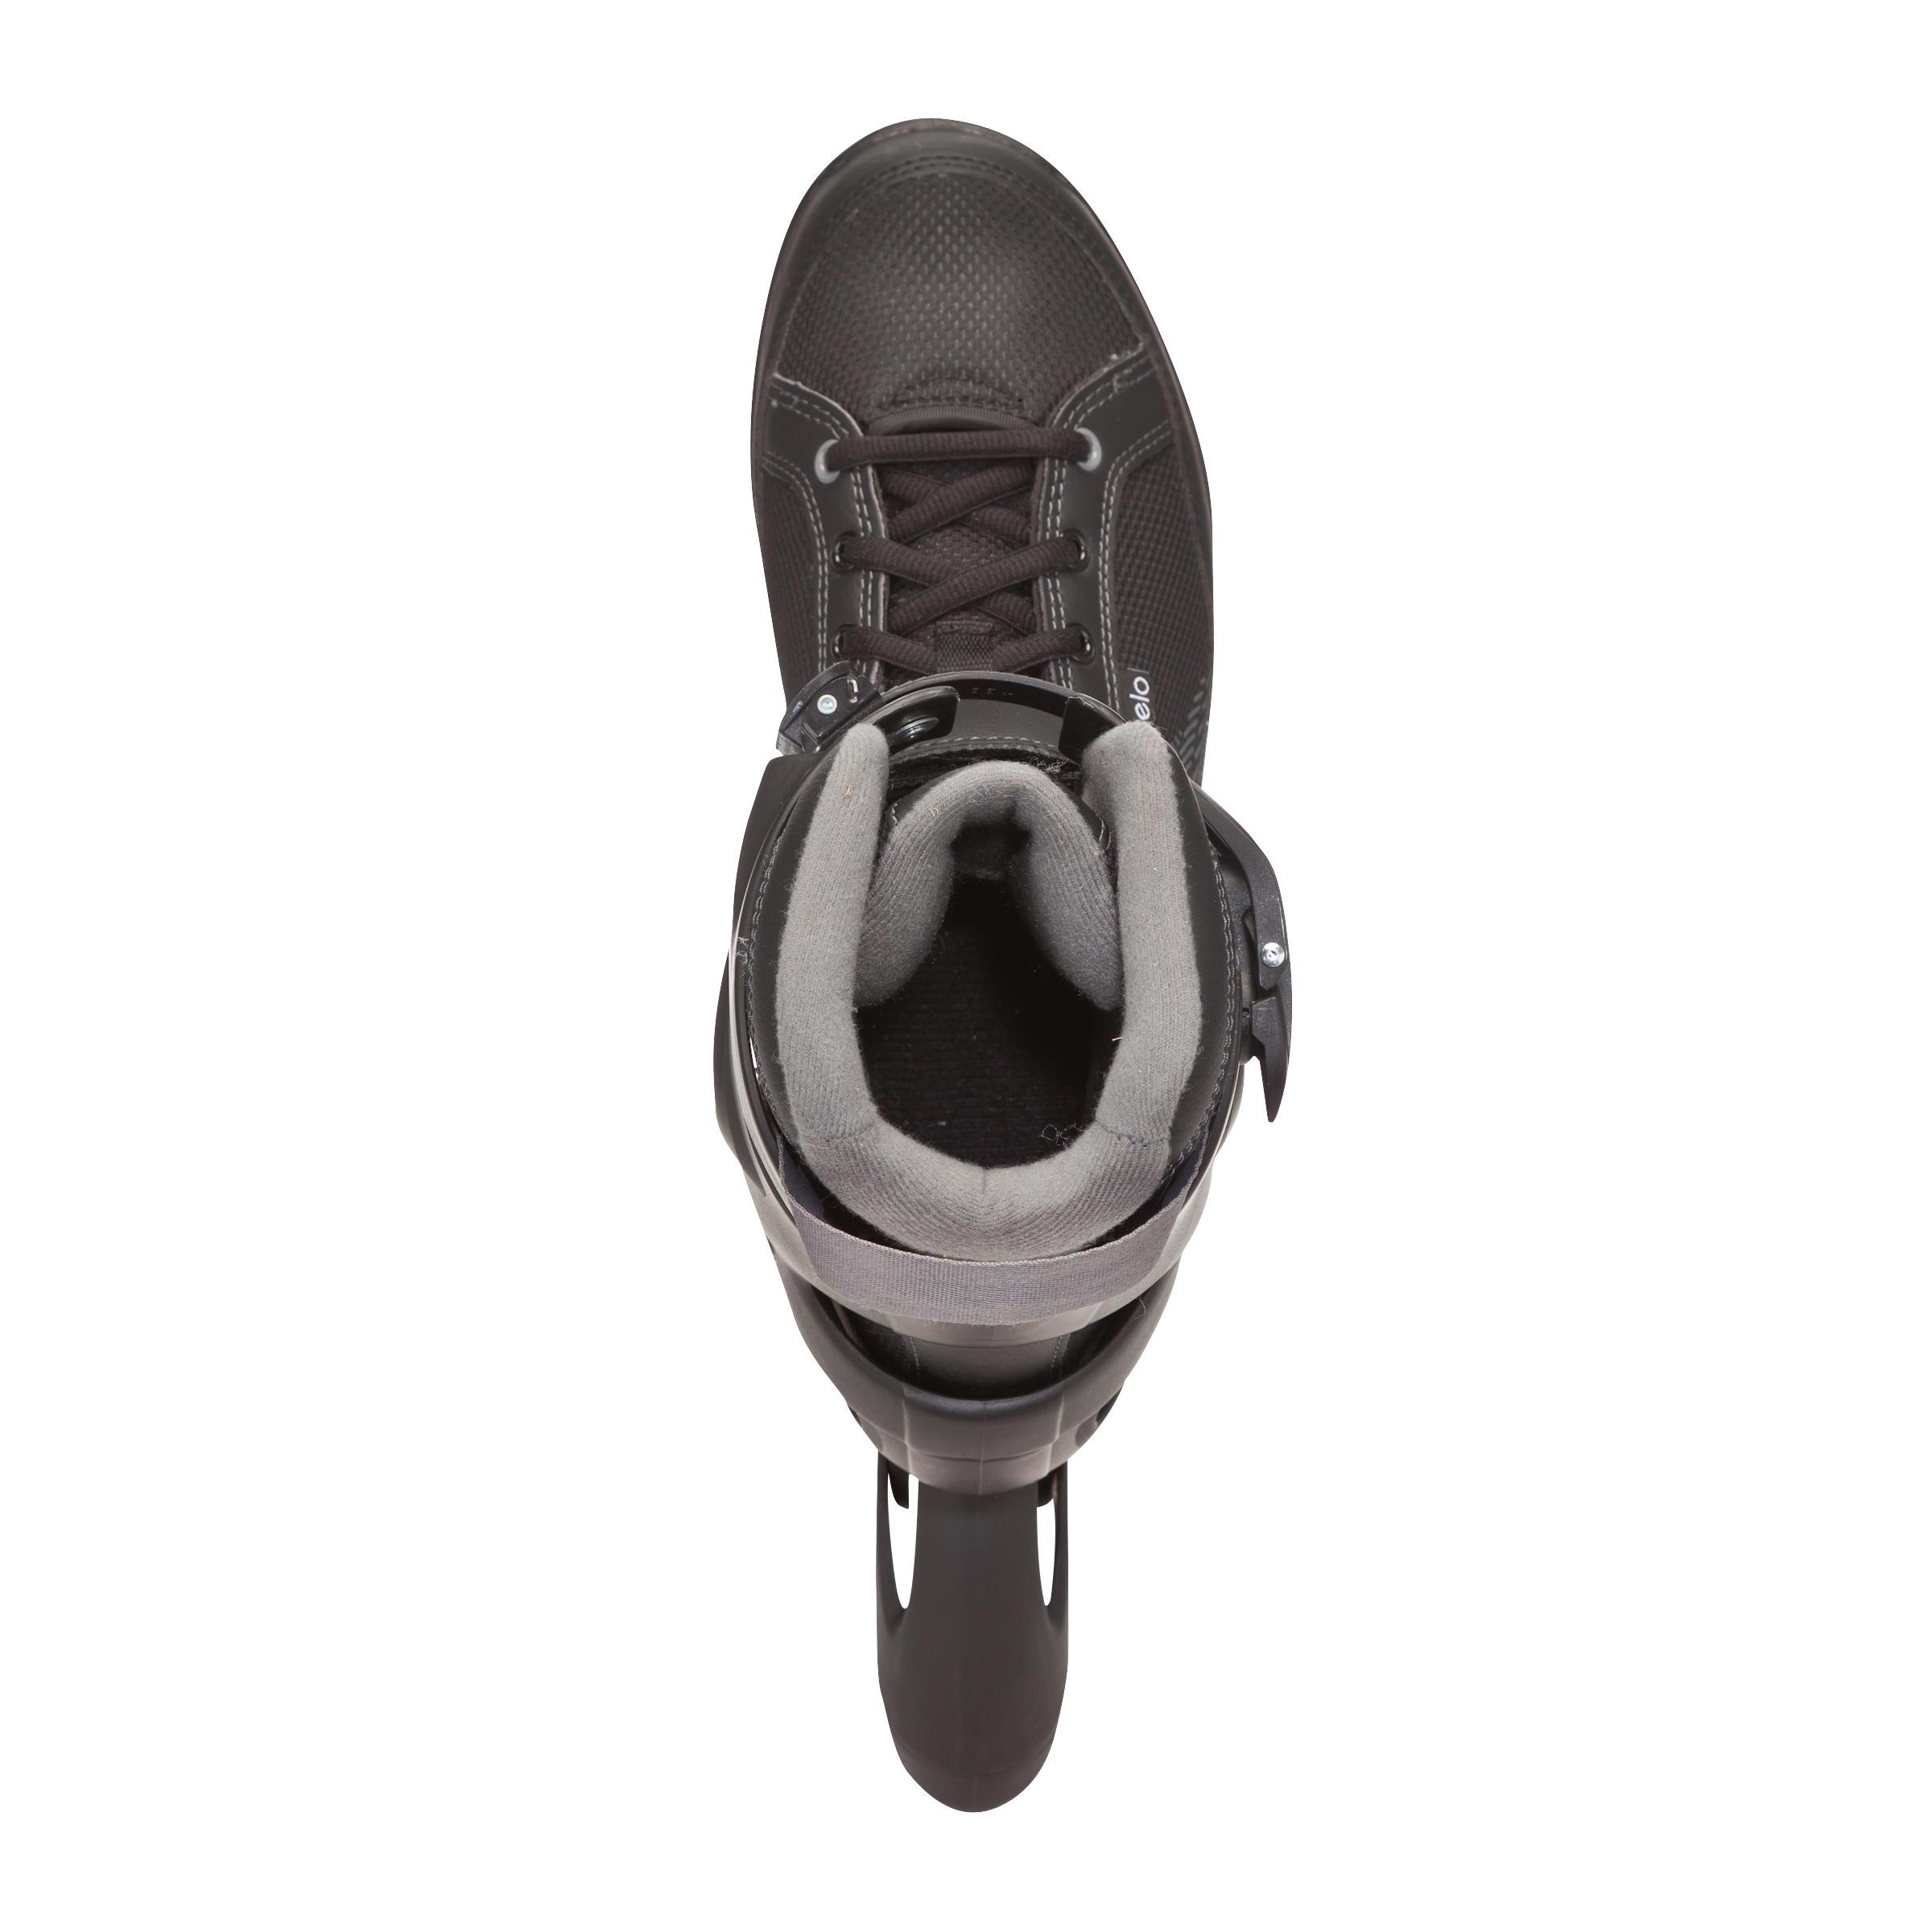 Fit 3 Men's Inline Fitness Skates - Black/Grey